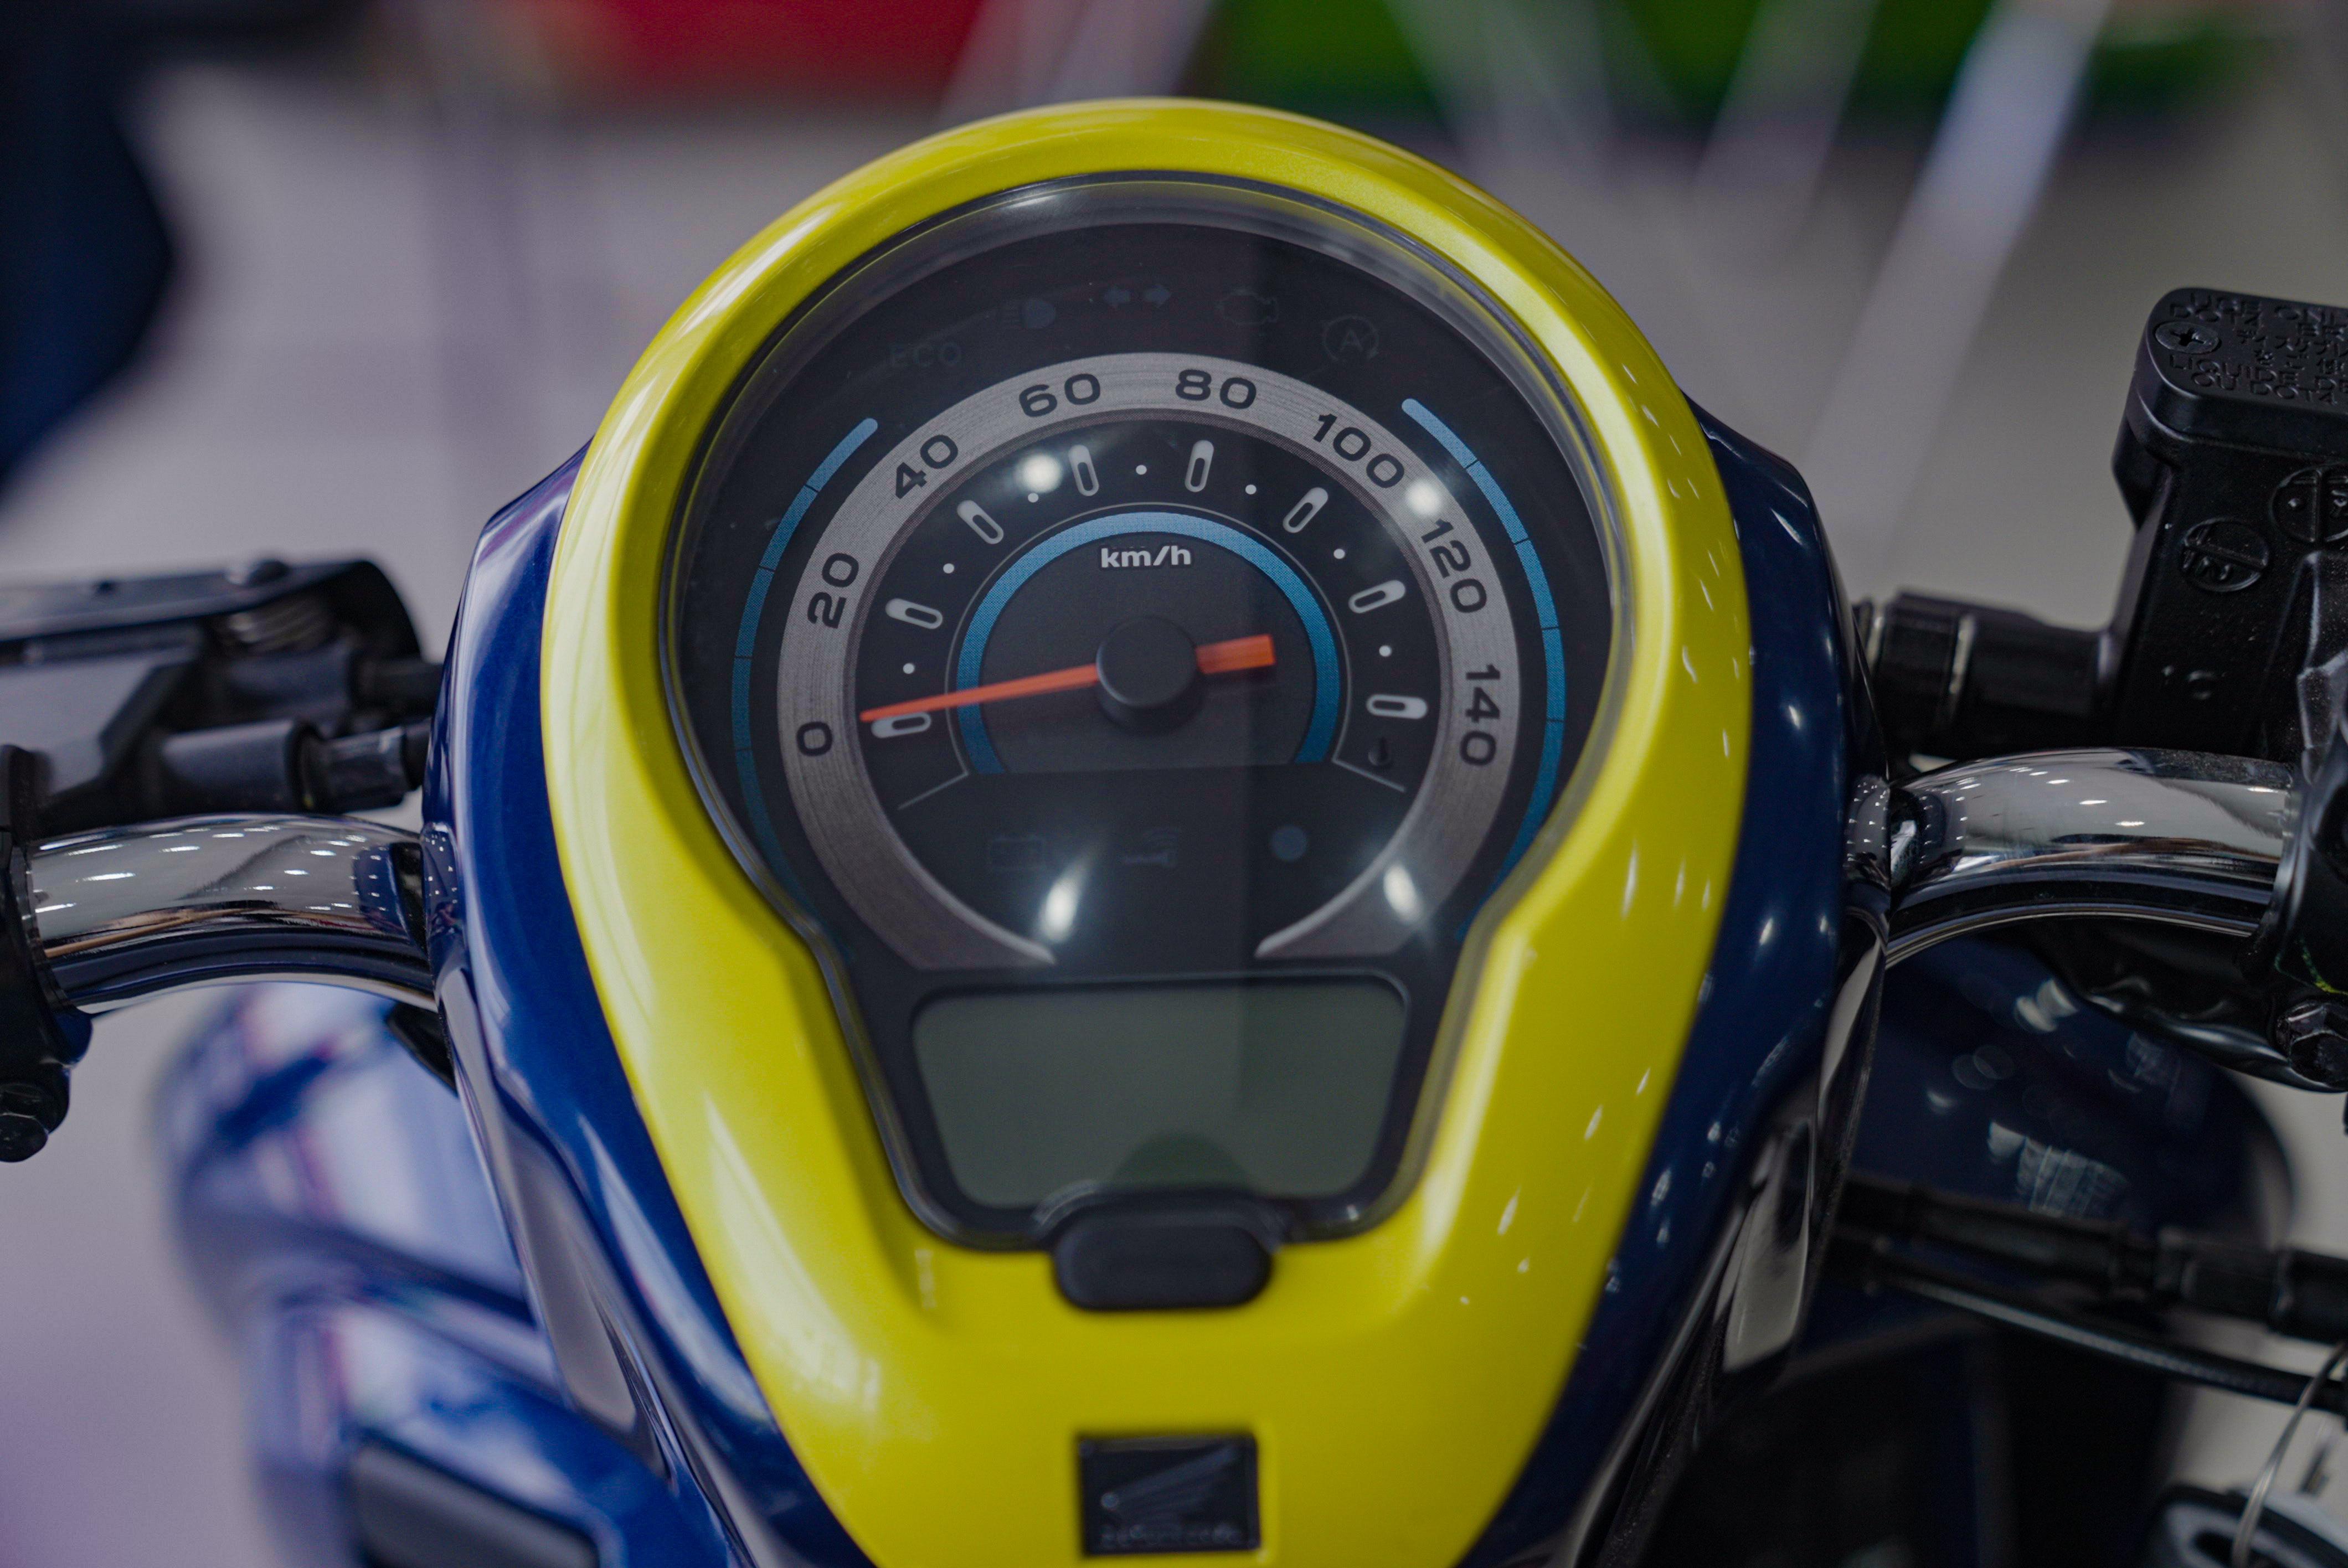 So sanh Honda Scoopy 2021 va Yamaha Janus anh 7